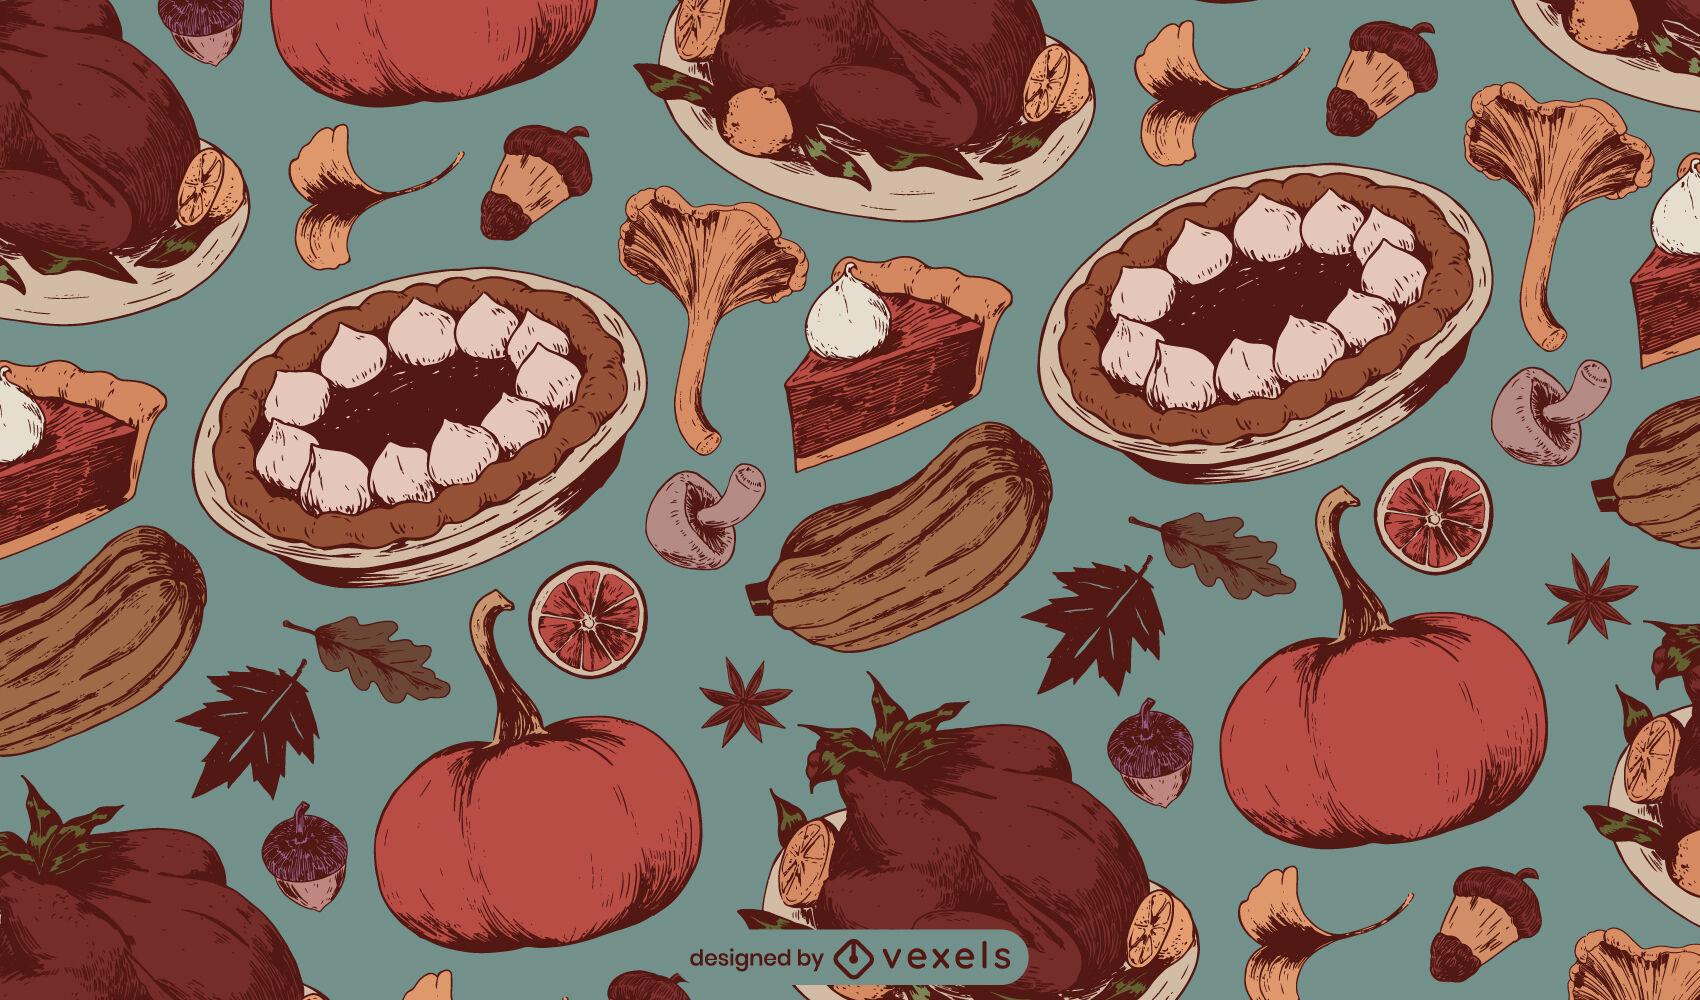 Diseño de patrón de comida navideña de acción de gracias